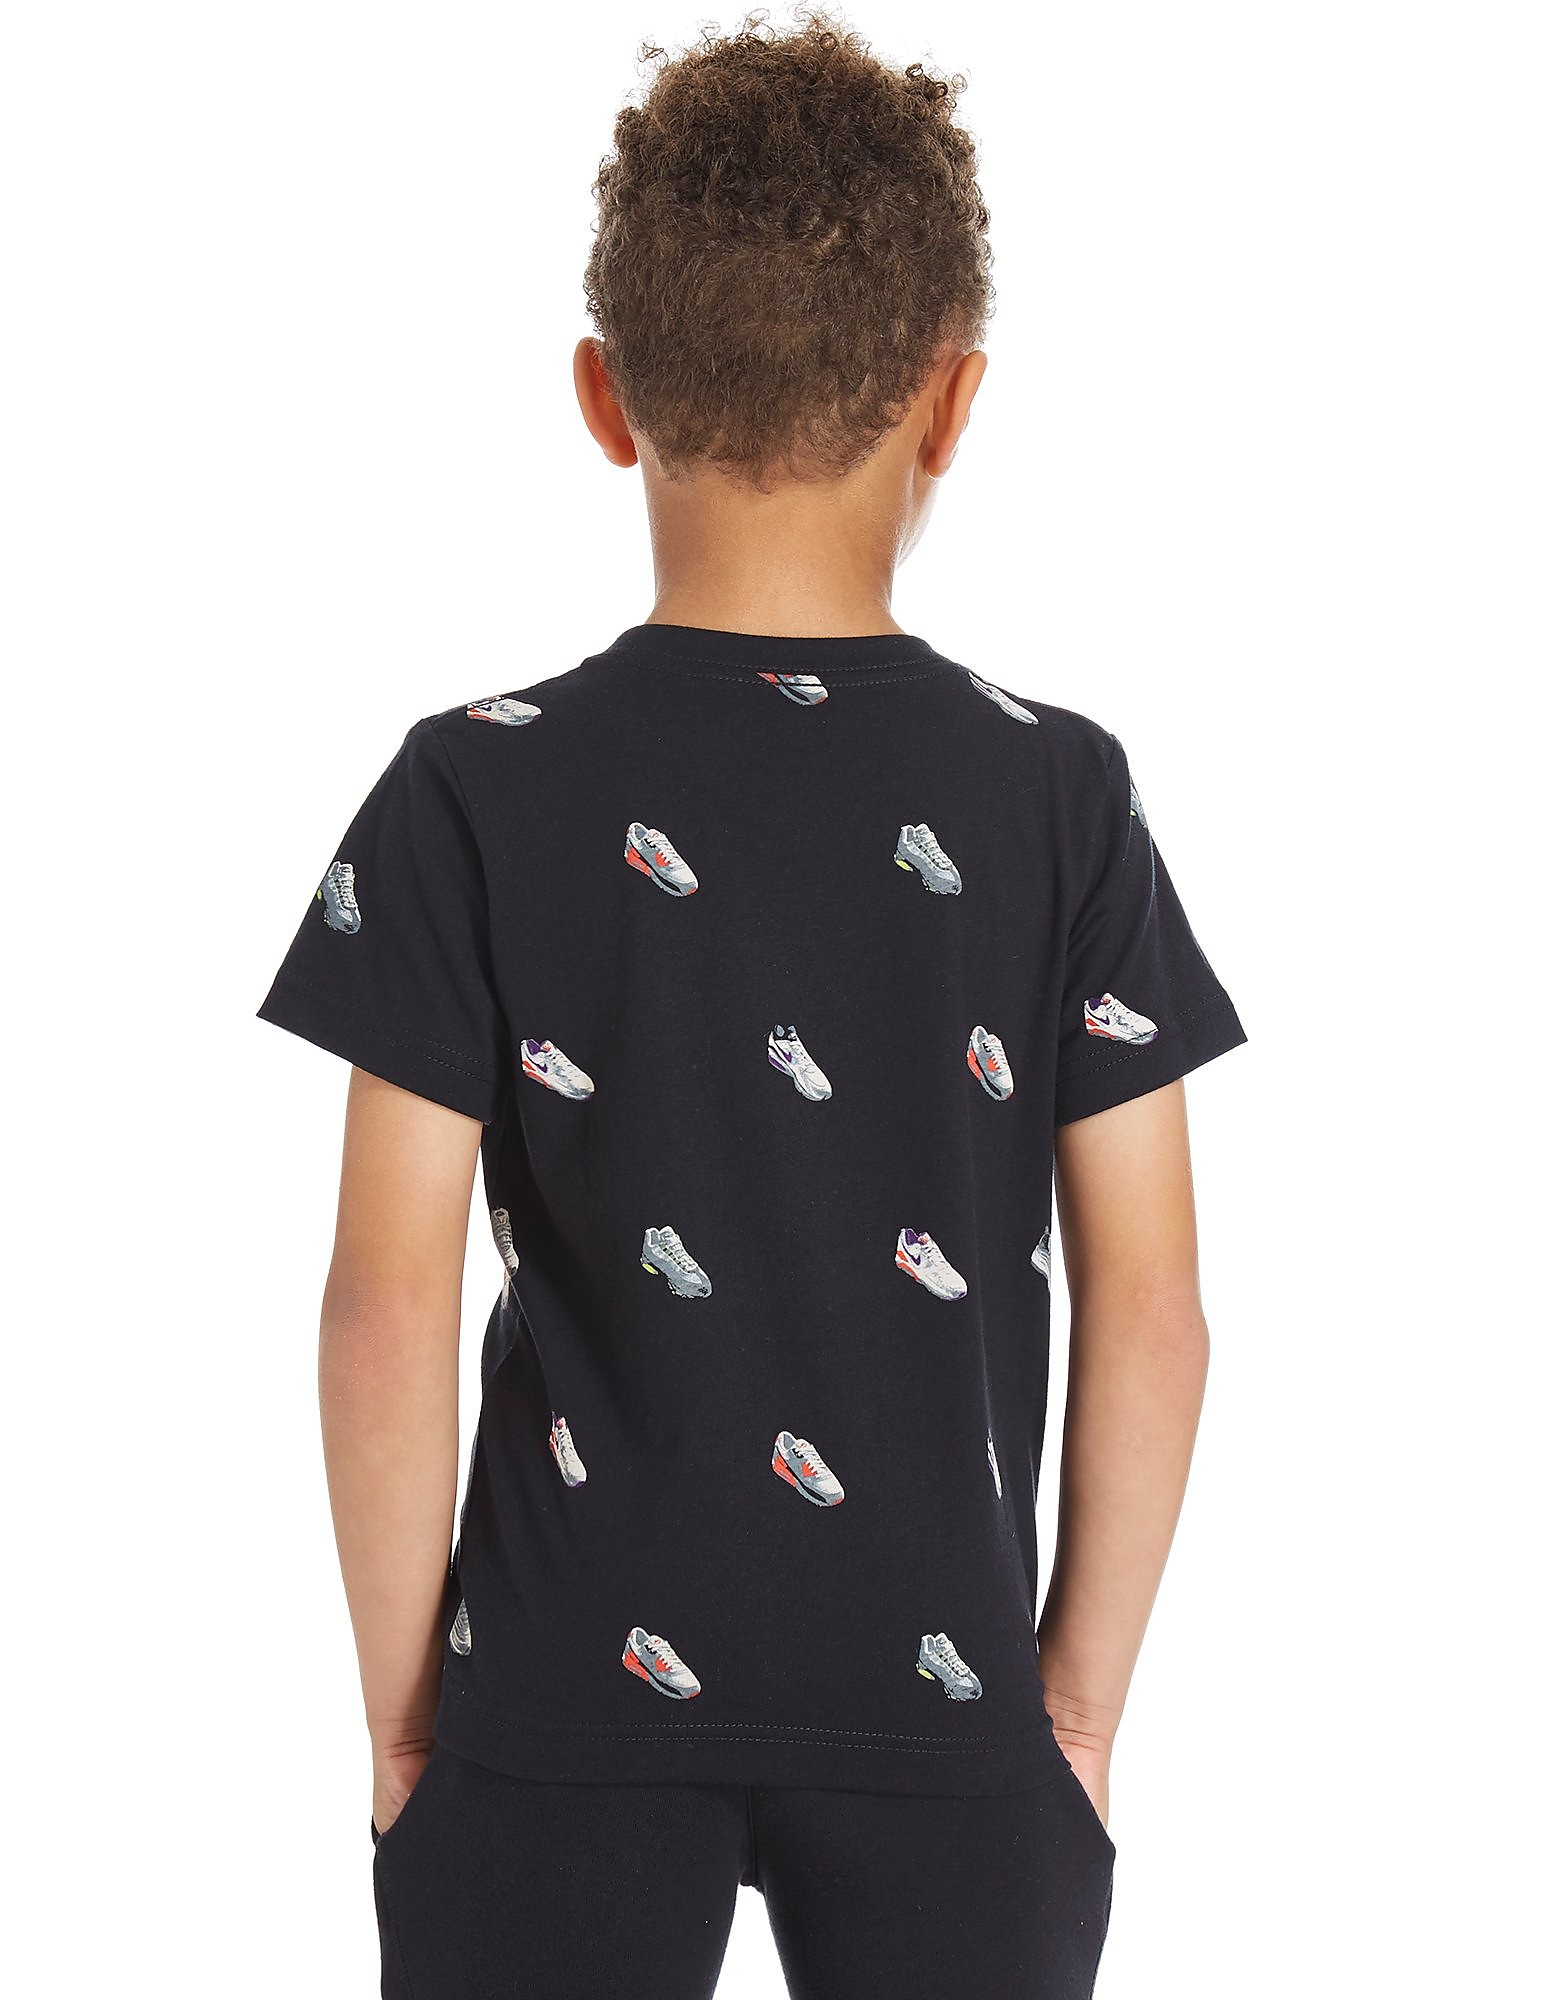 Nike T-Shirt Enfant Air Shoe Print